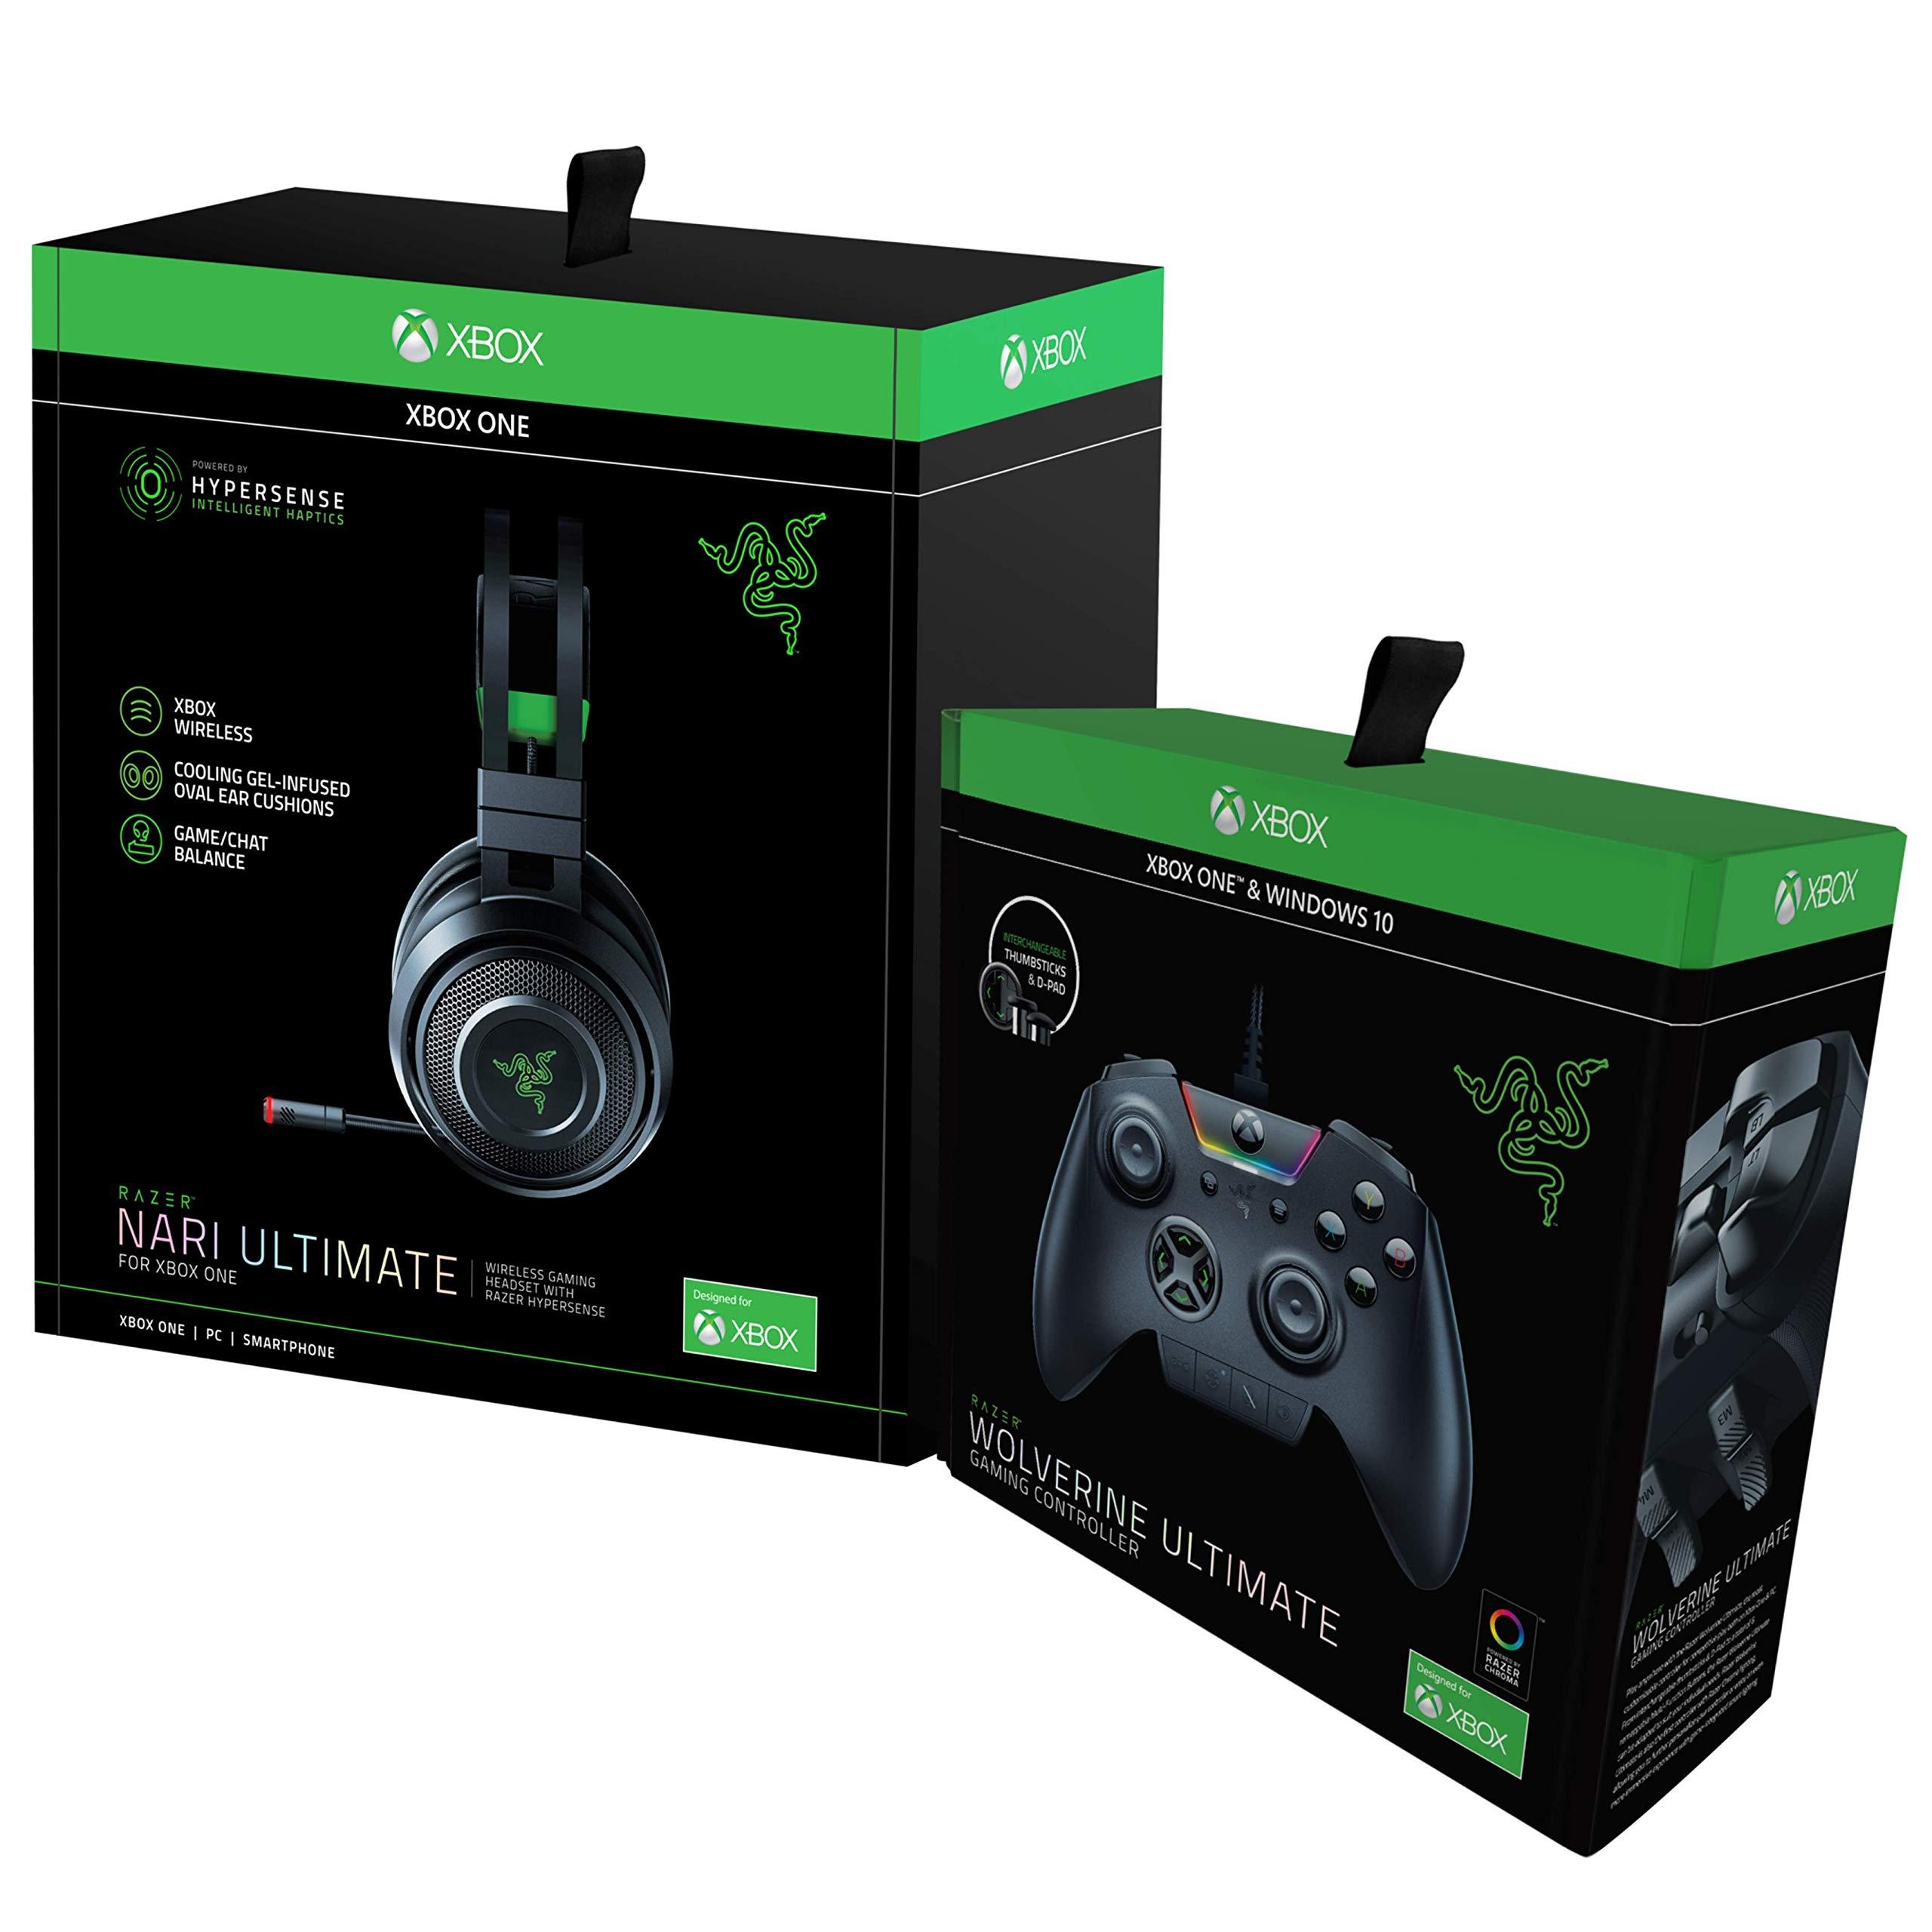 Razer Wolverine Ultimate Xbox One Gaming Controller + Nari Ultimate for Xbox One Gaming Headset Bundle